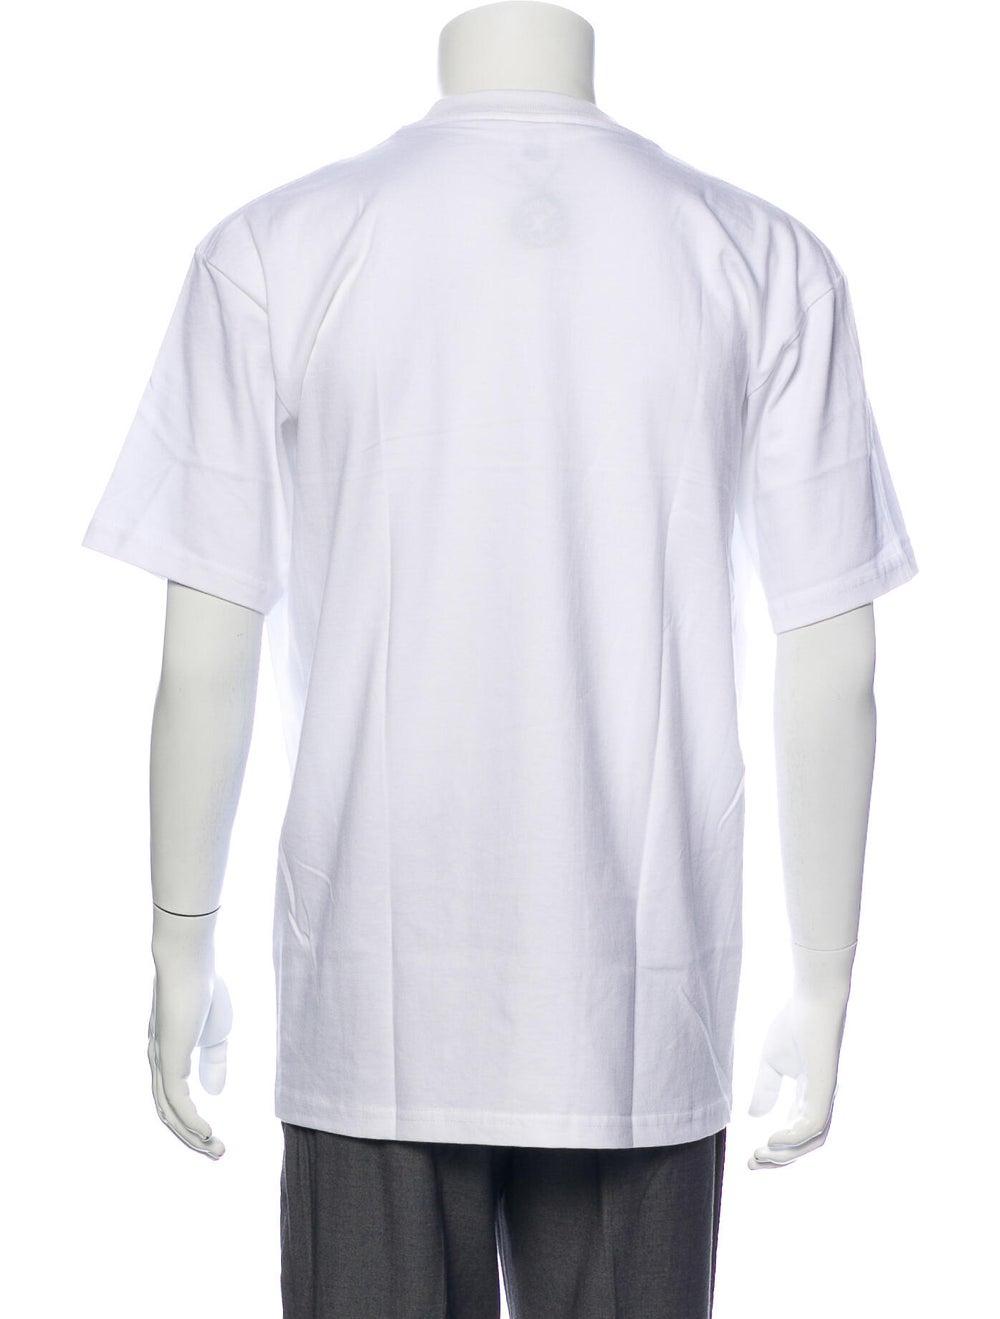 Supreme 2018 Madonna T-Shirt White - image 3